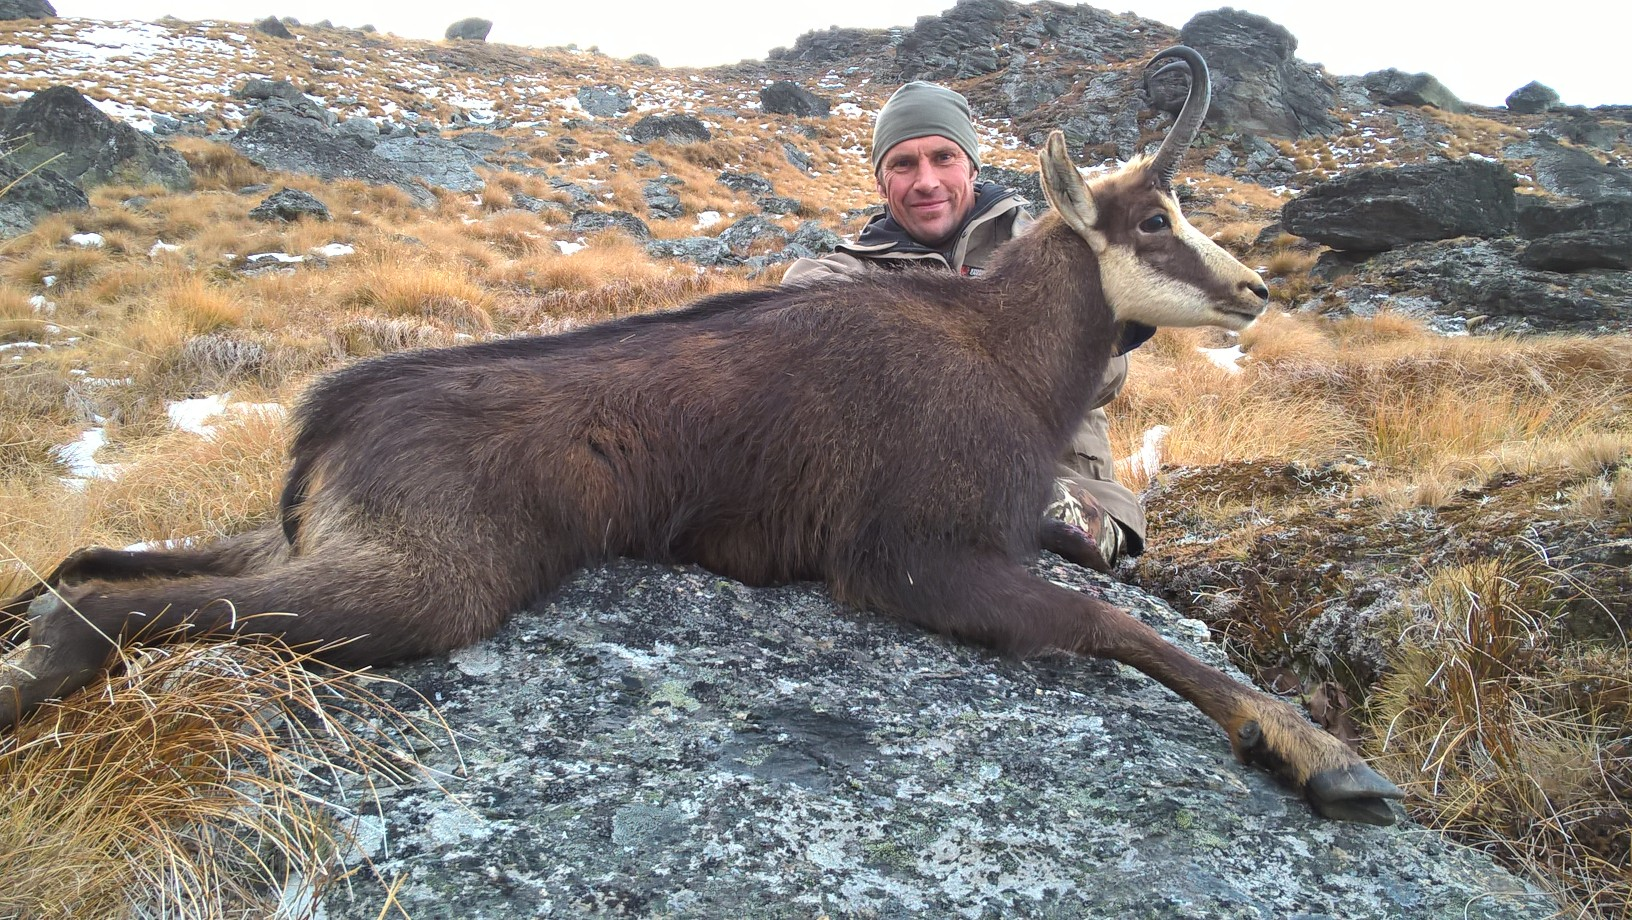 Finally we found a Buck!